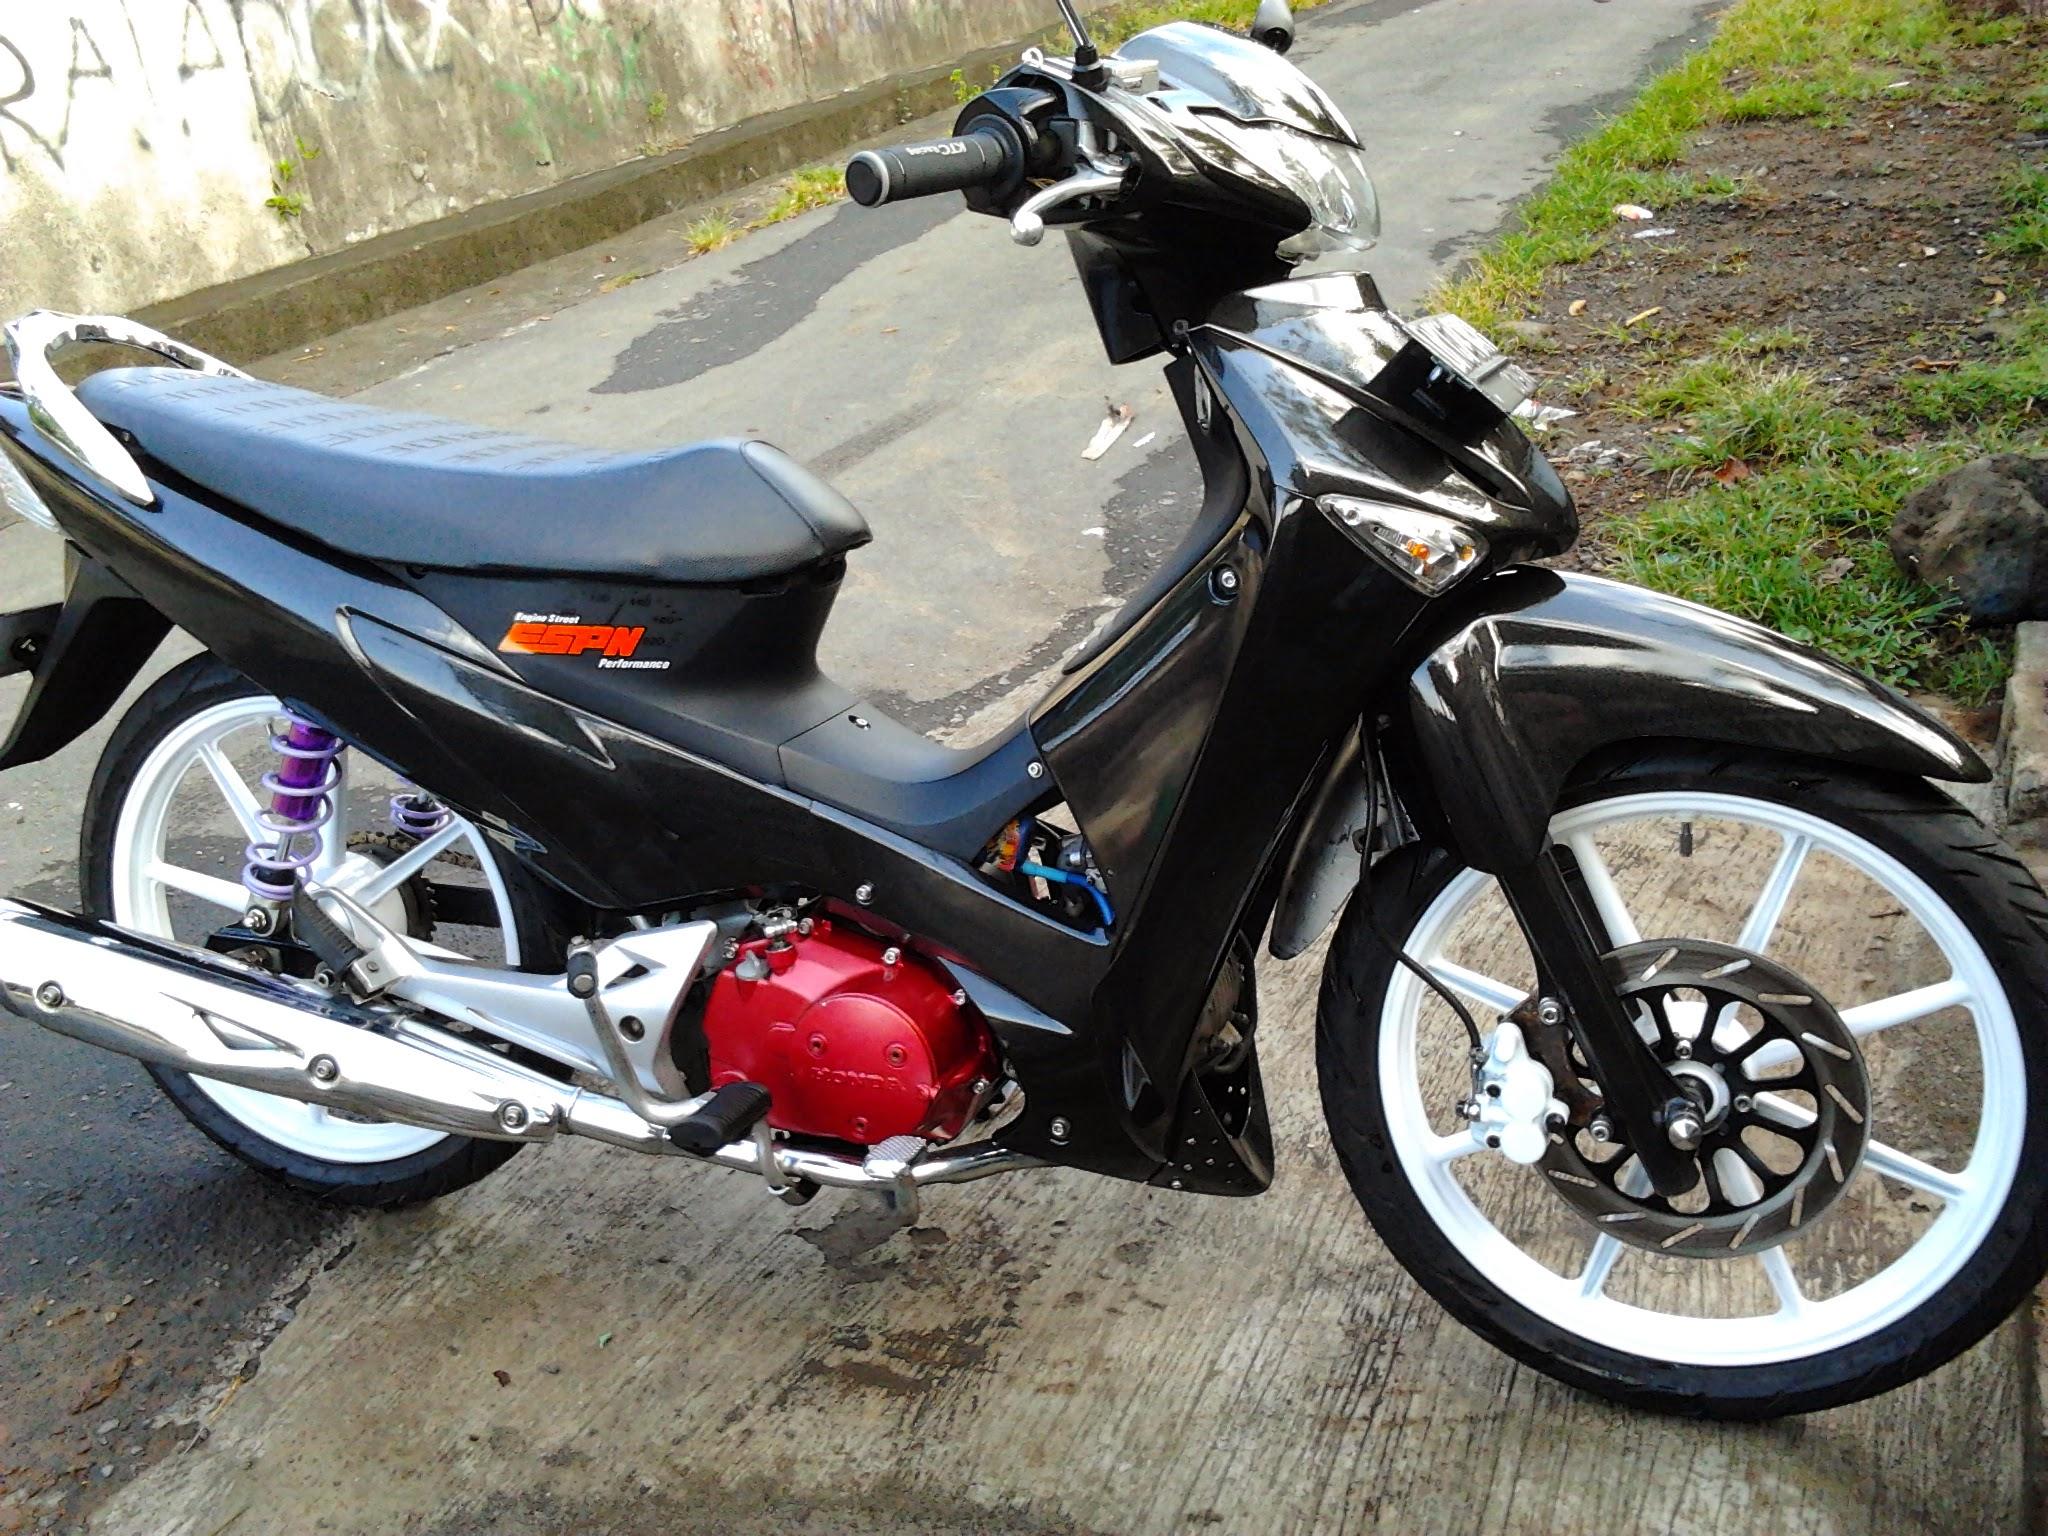 Modifikasi Motor Honda Kharisma 125 Thecitycyclist